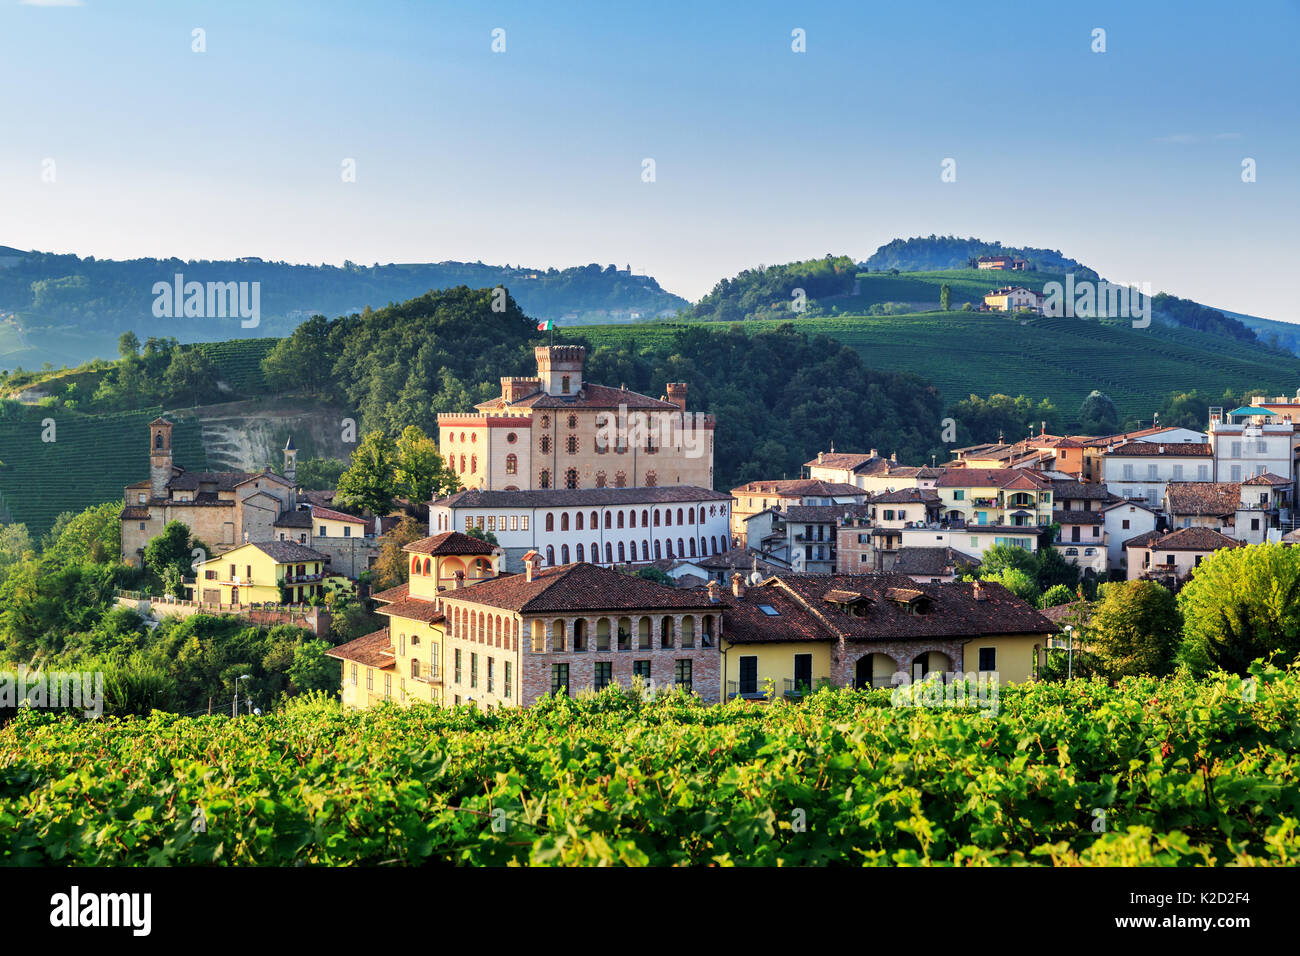 Pueblo de Barolo con Barolo, castillo Castello di Barolo, Piamonte, Italia Imagen De Stock